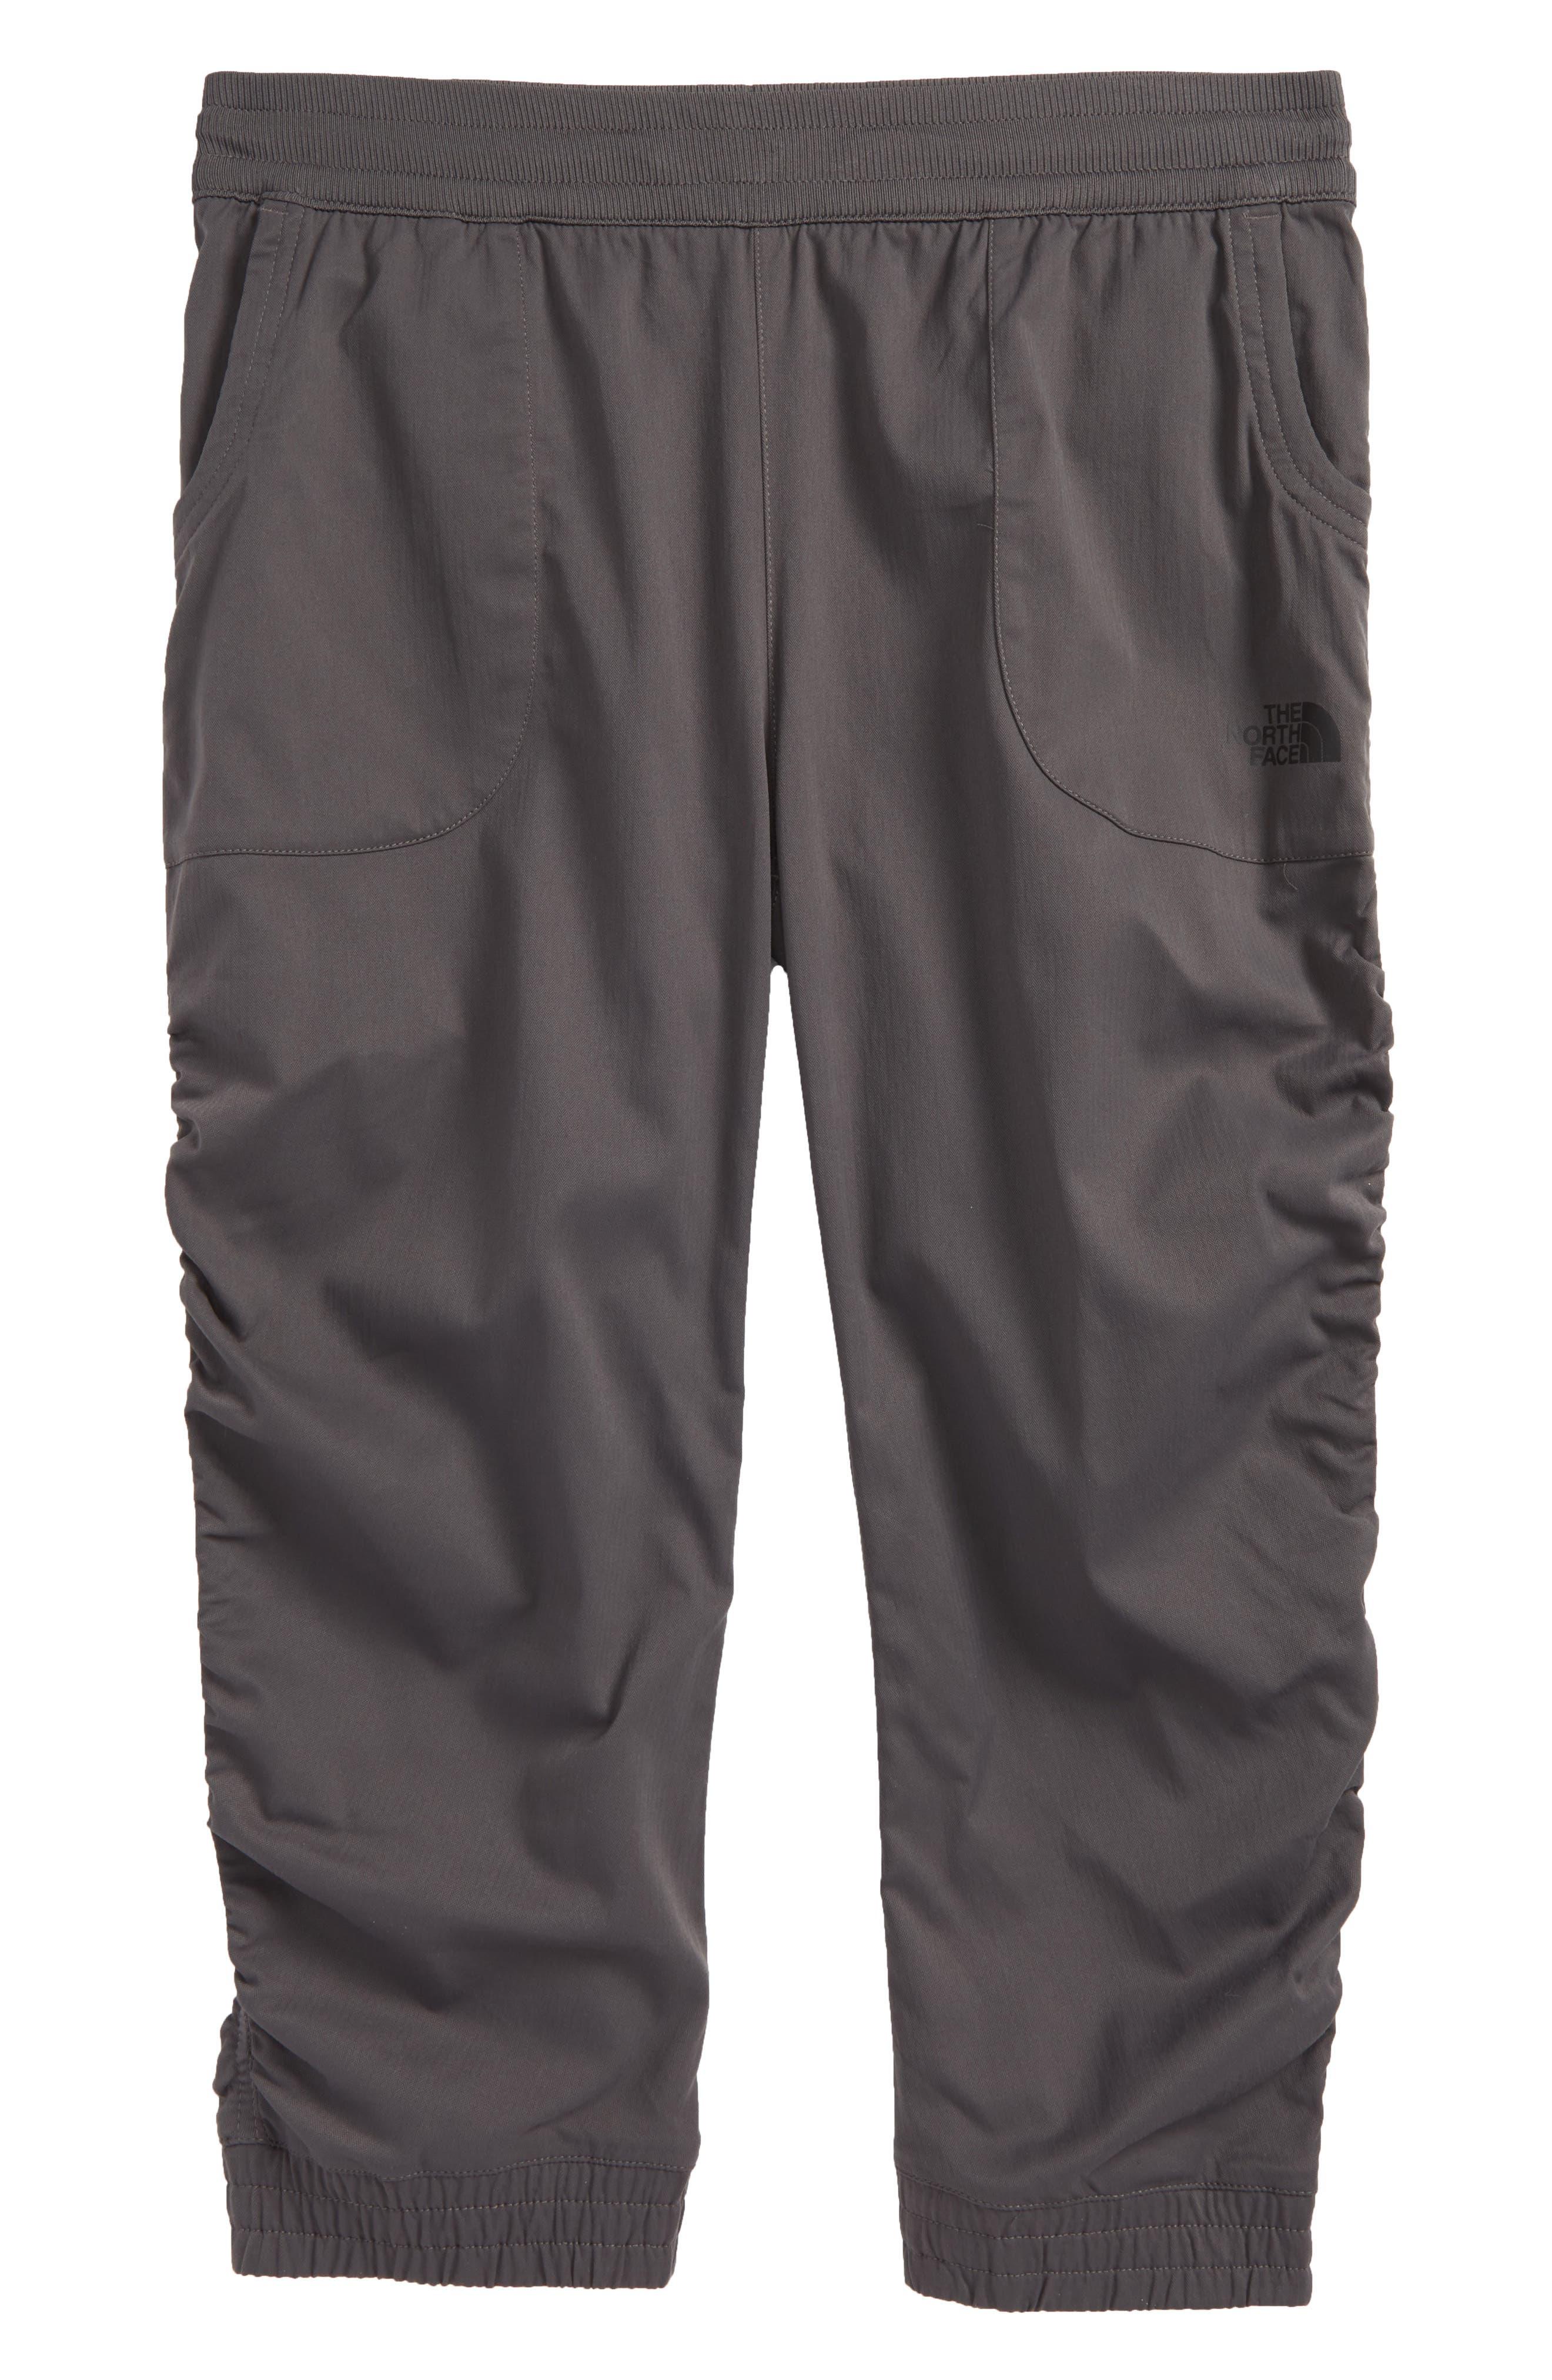 Aphrodite Pants,                         Main,                         color, Graphite Grey